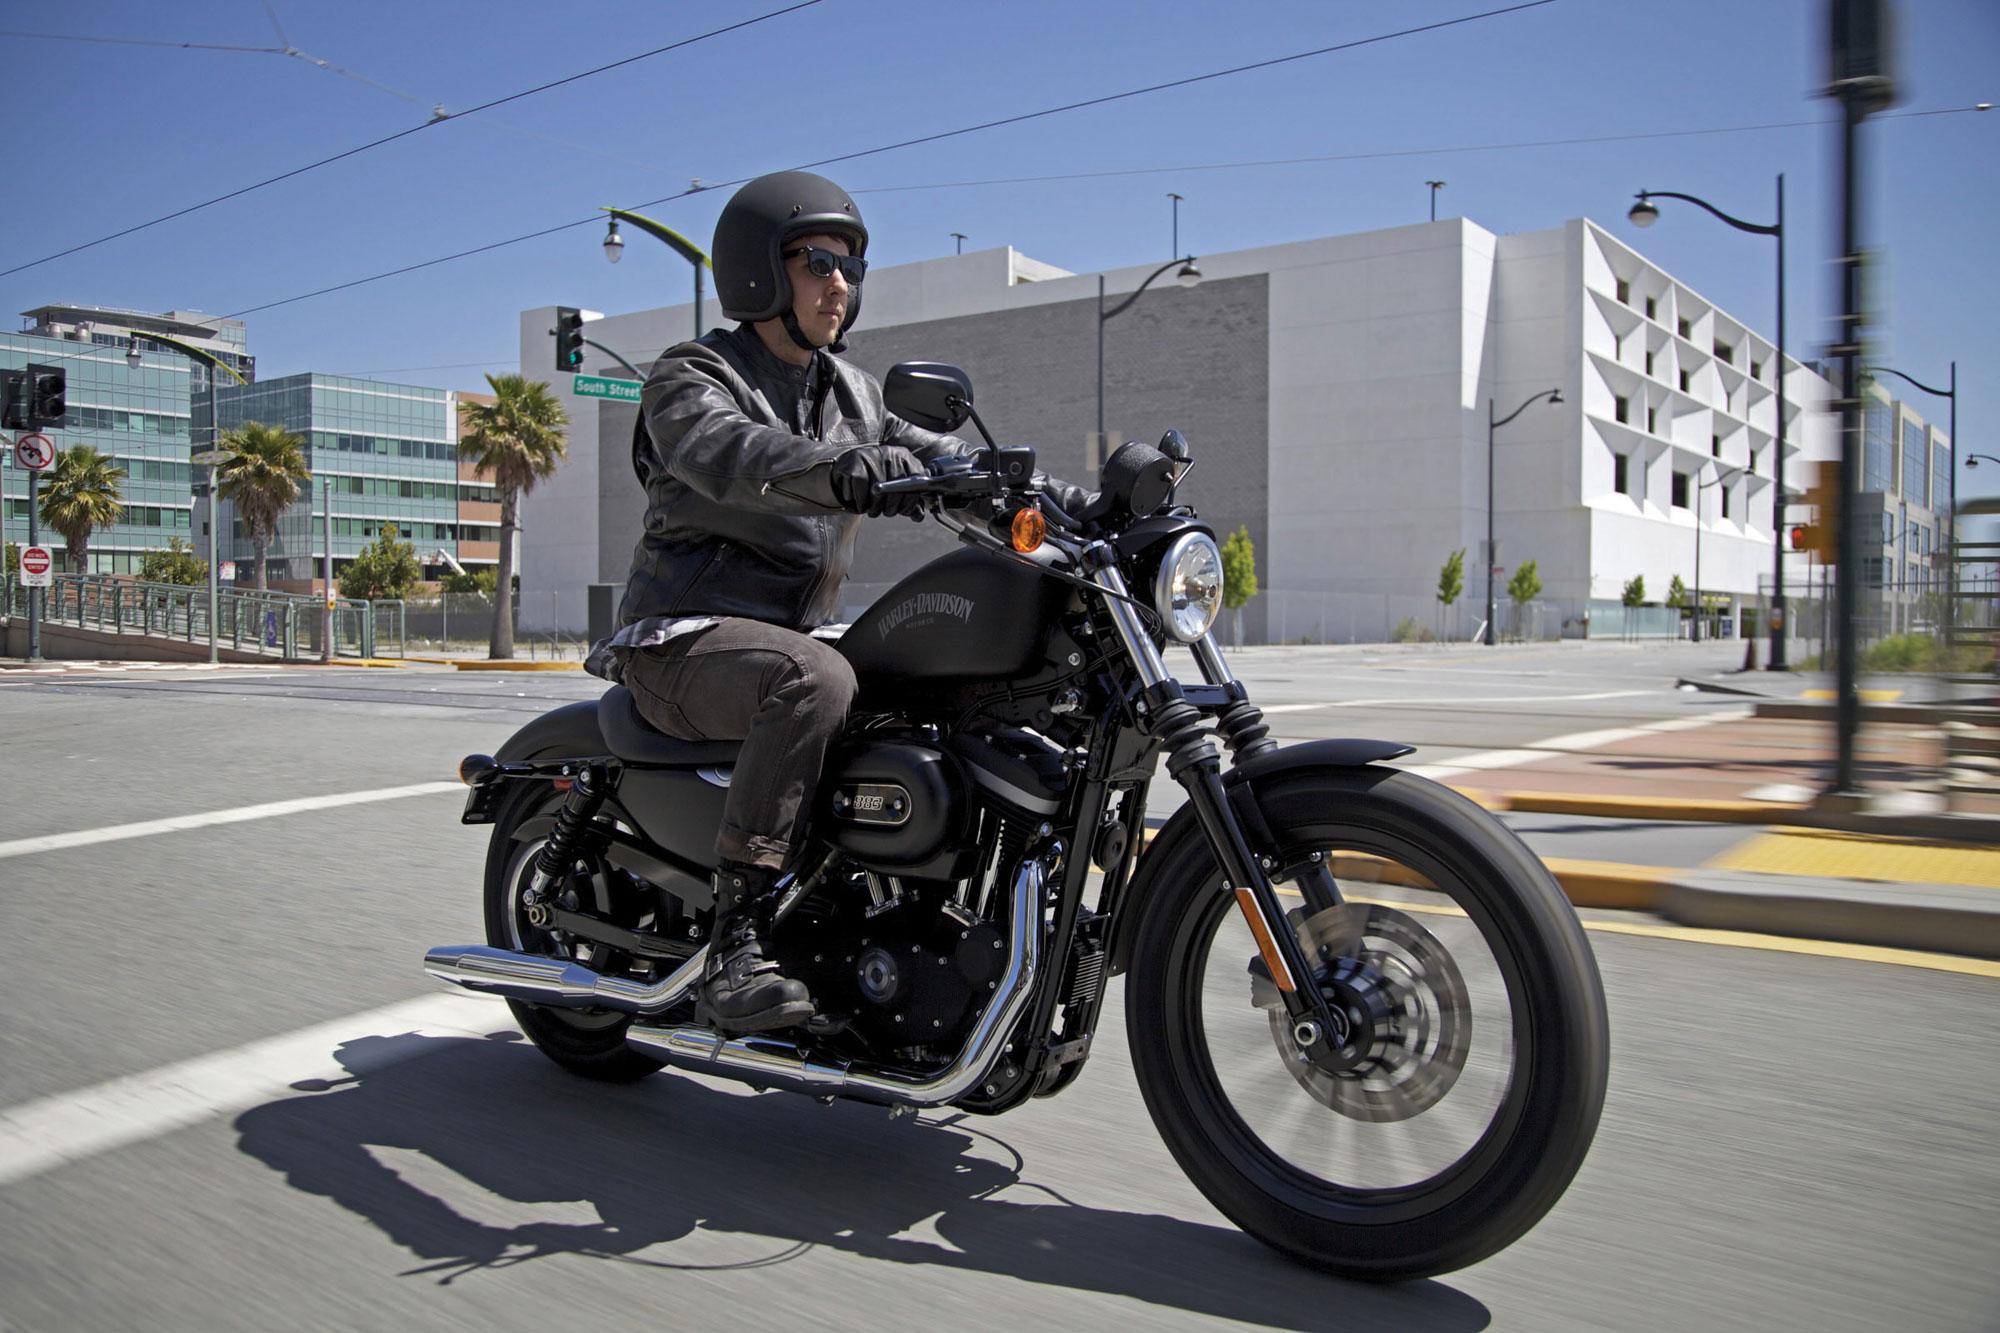 Harley 48 review uk dating 2